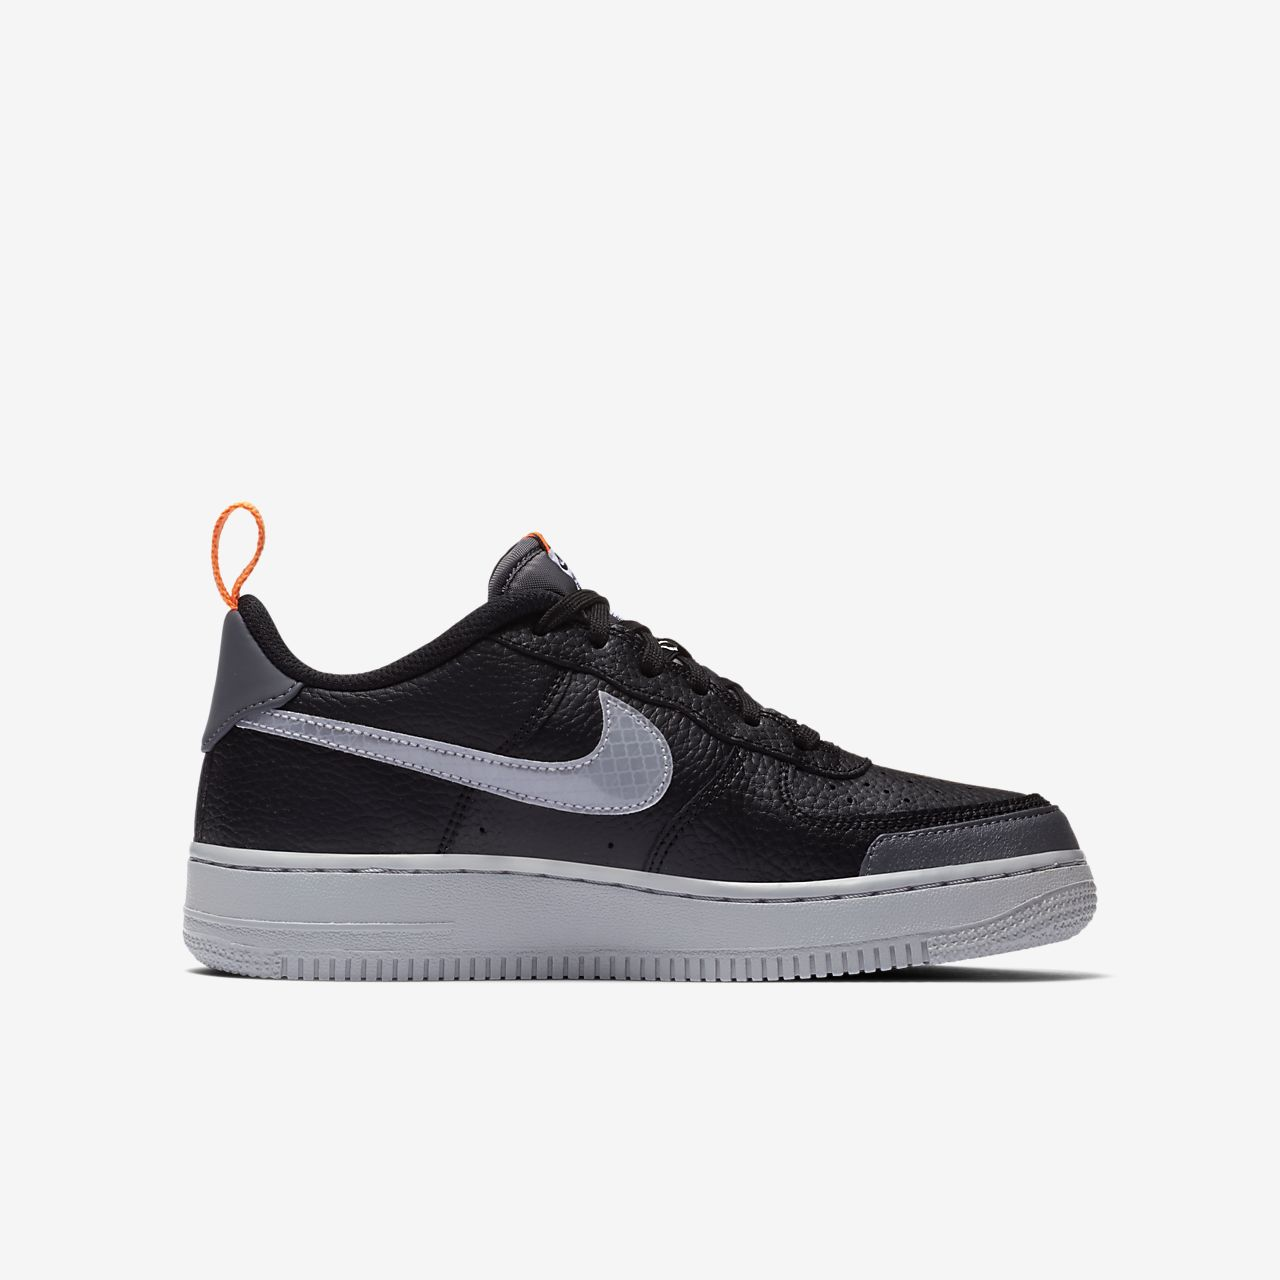 Nike Air Force 1 07 Lv8 2 WhiteWolf Grey